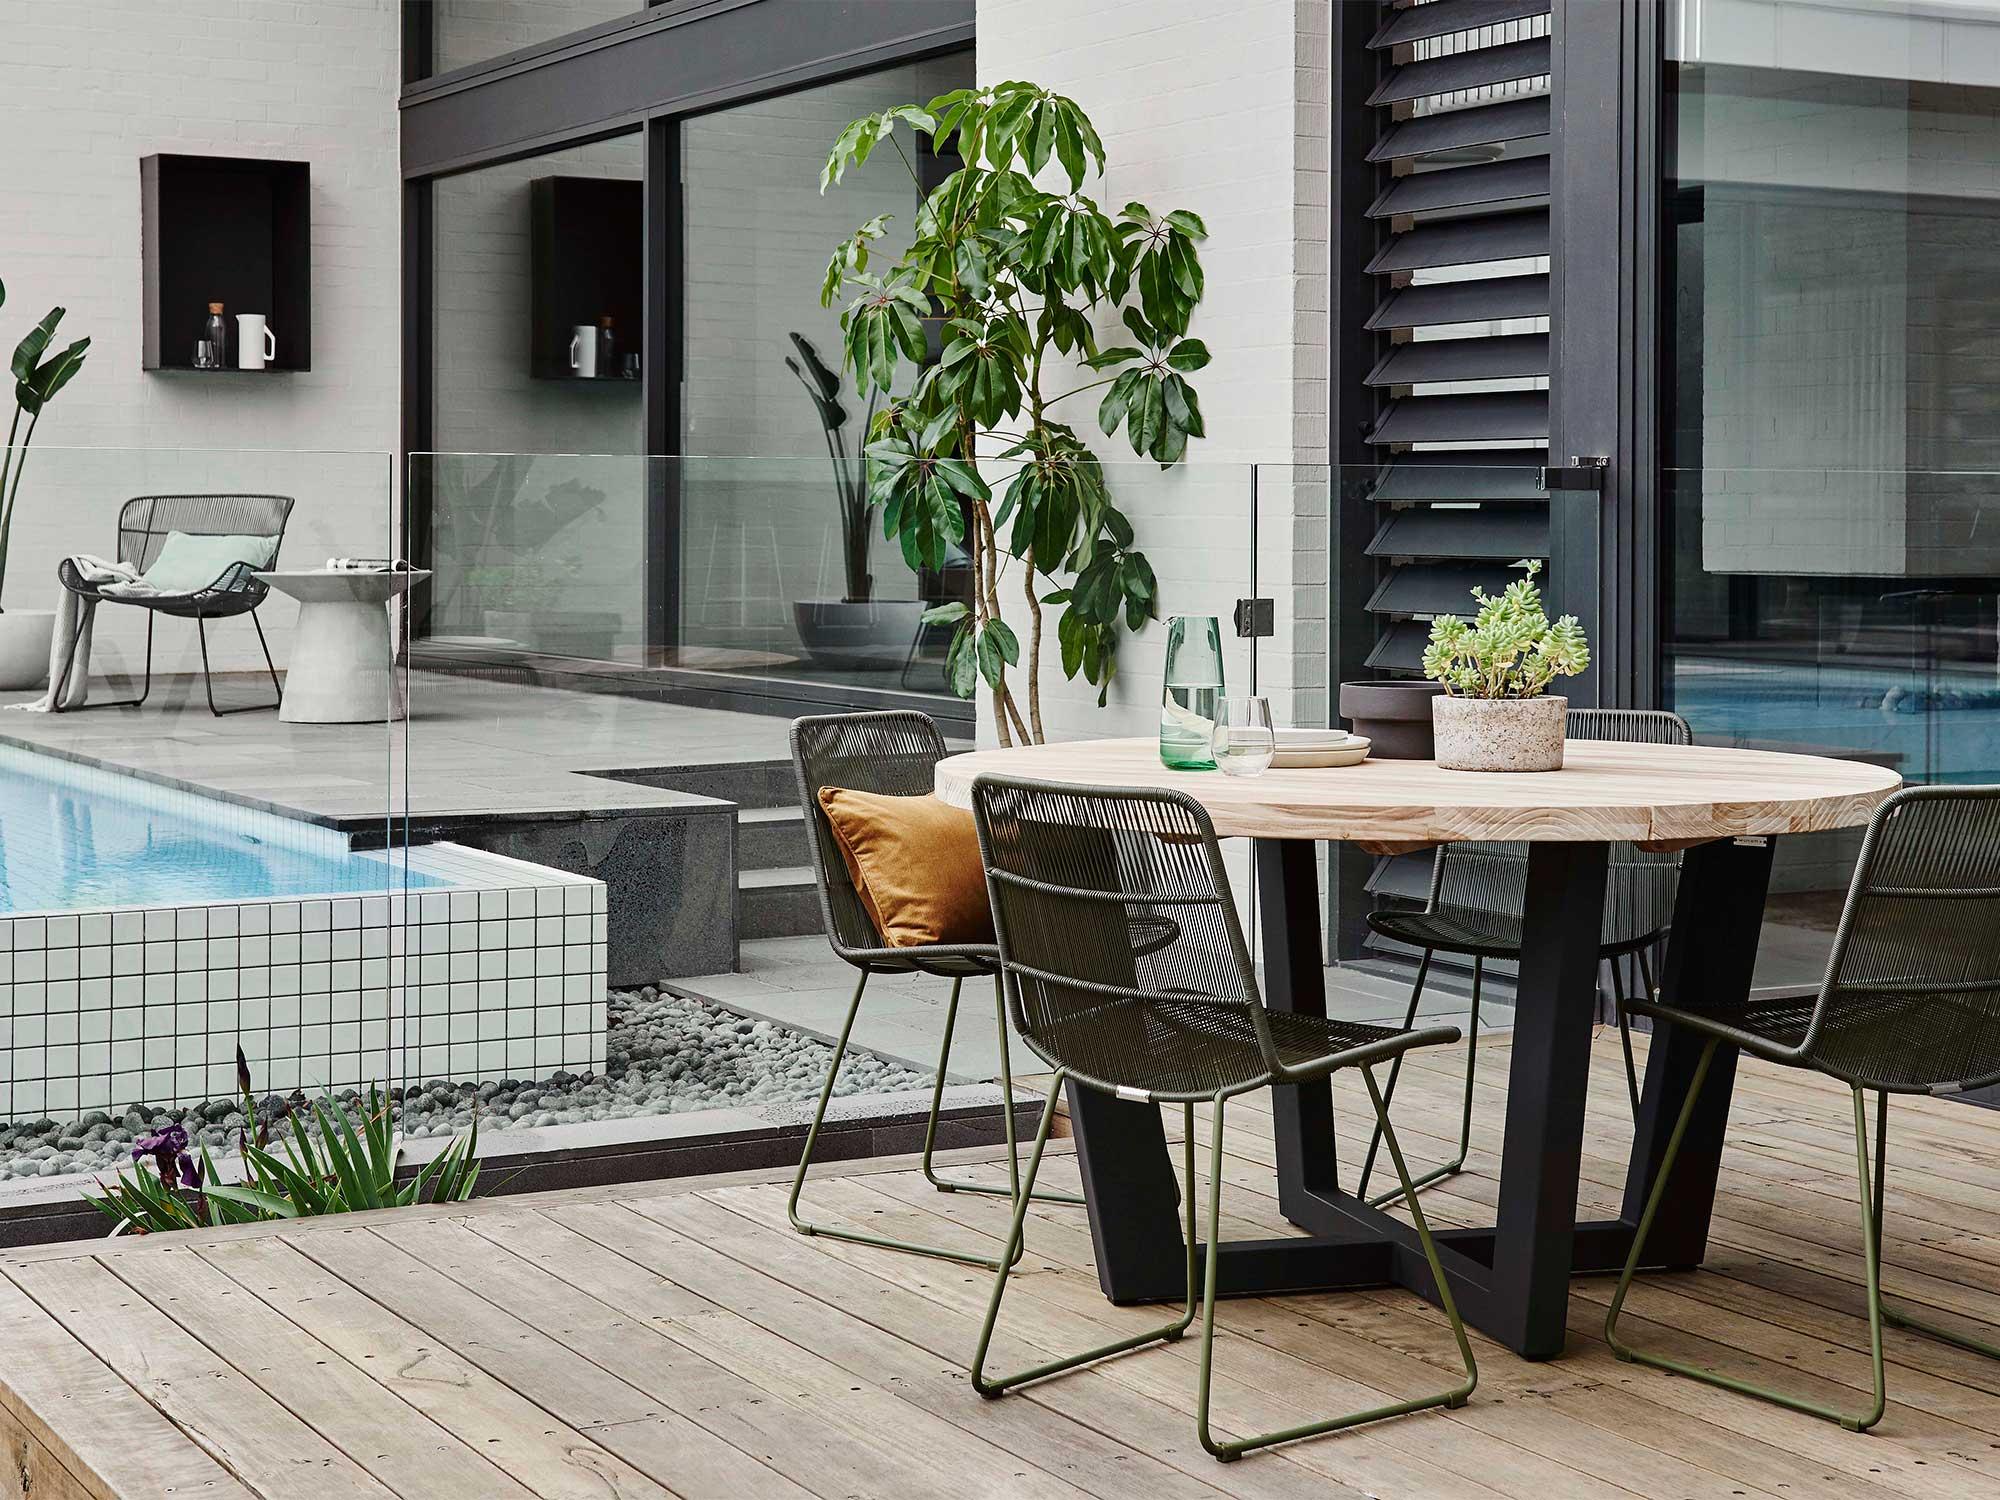 Outdoor Living Ideas & Outdoor Area Photos - realestate.com.au on Outdoor Living Designer id=49732